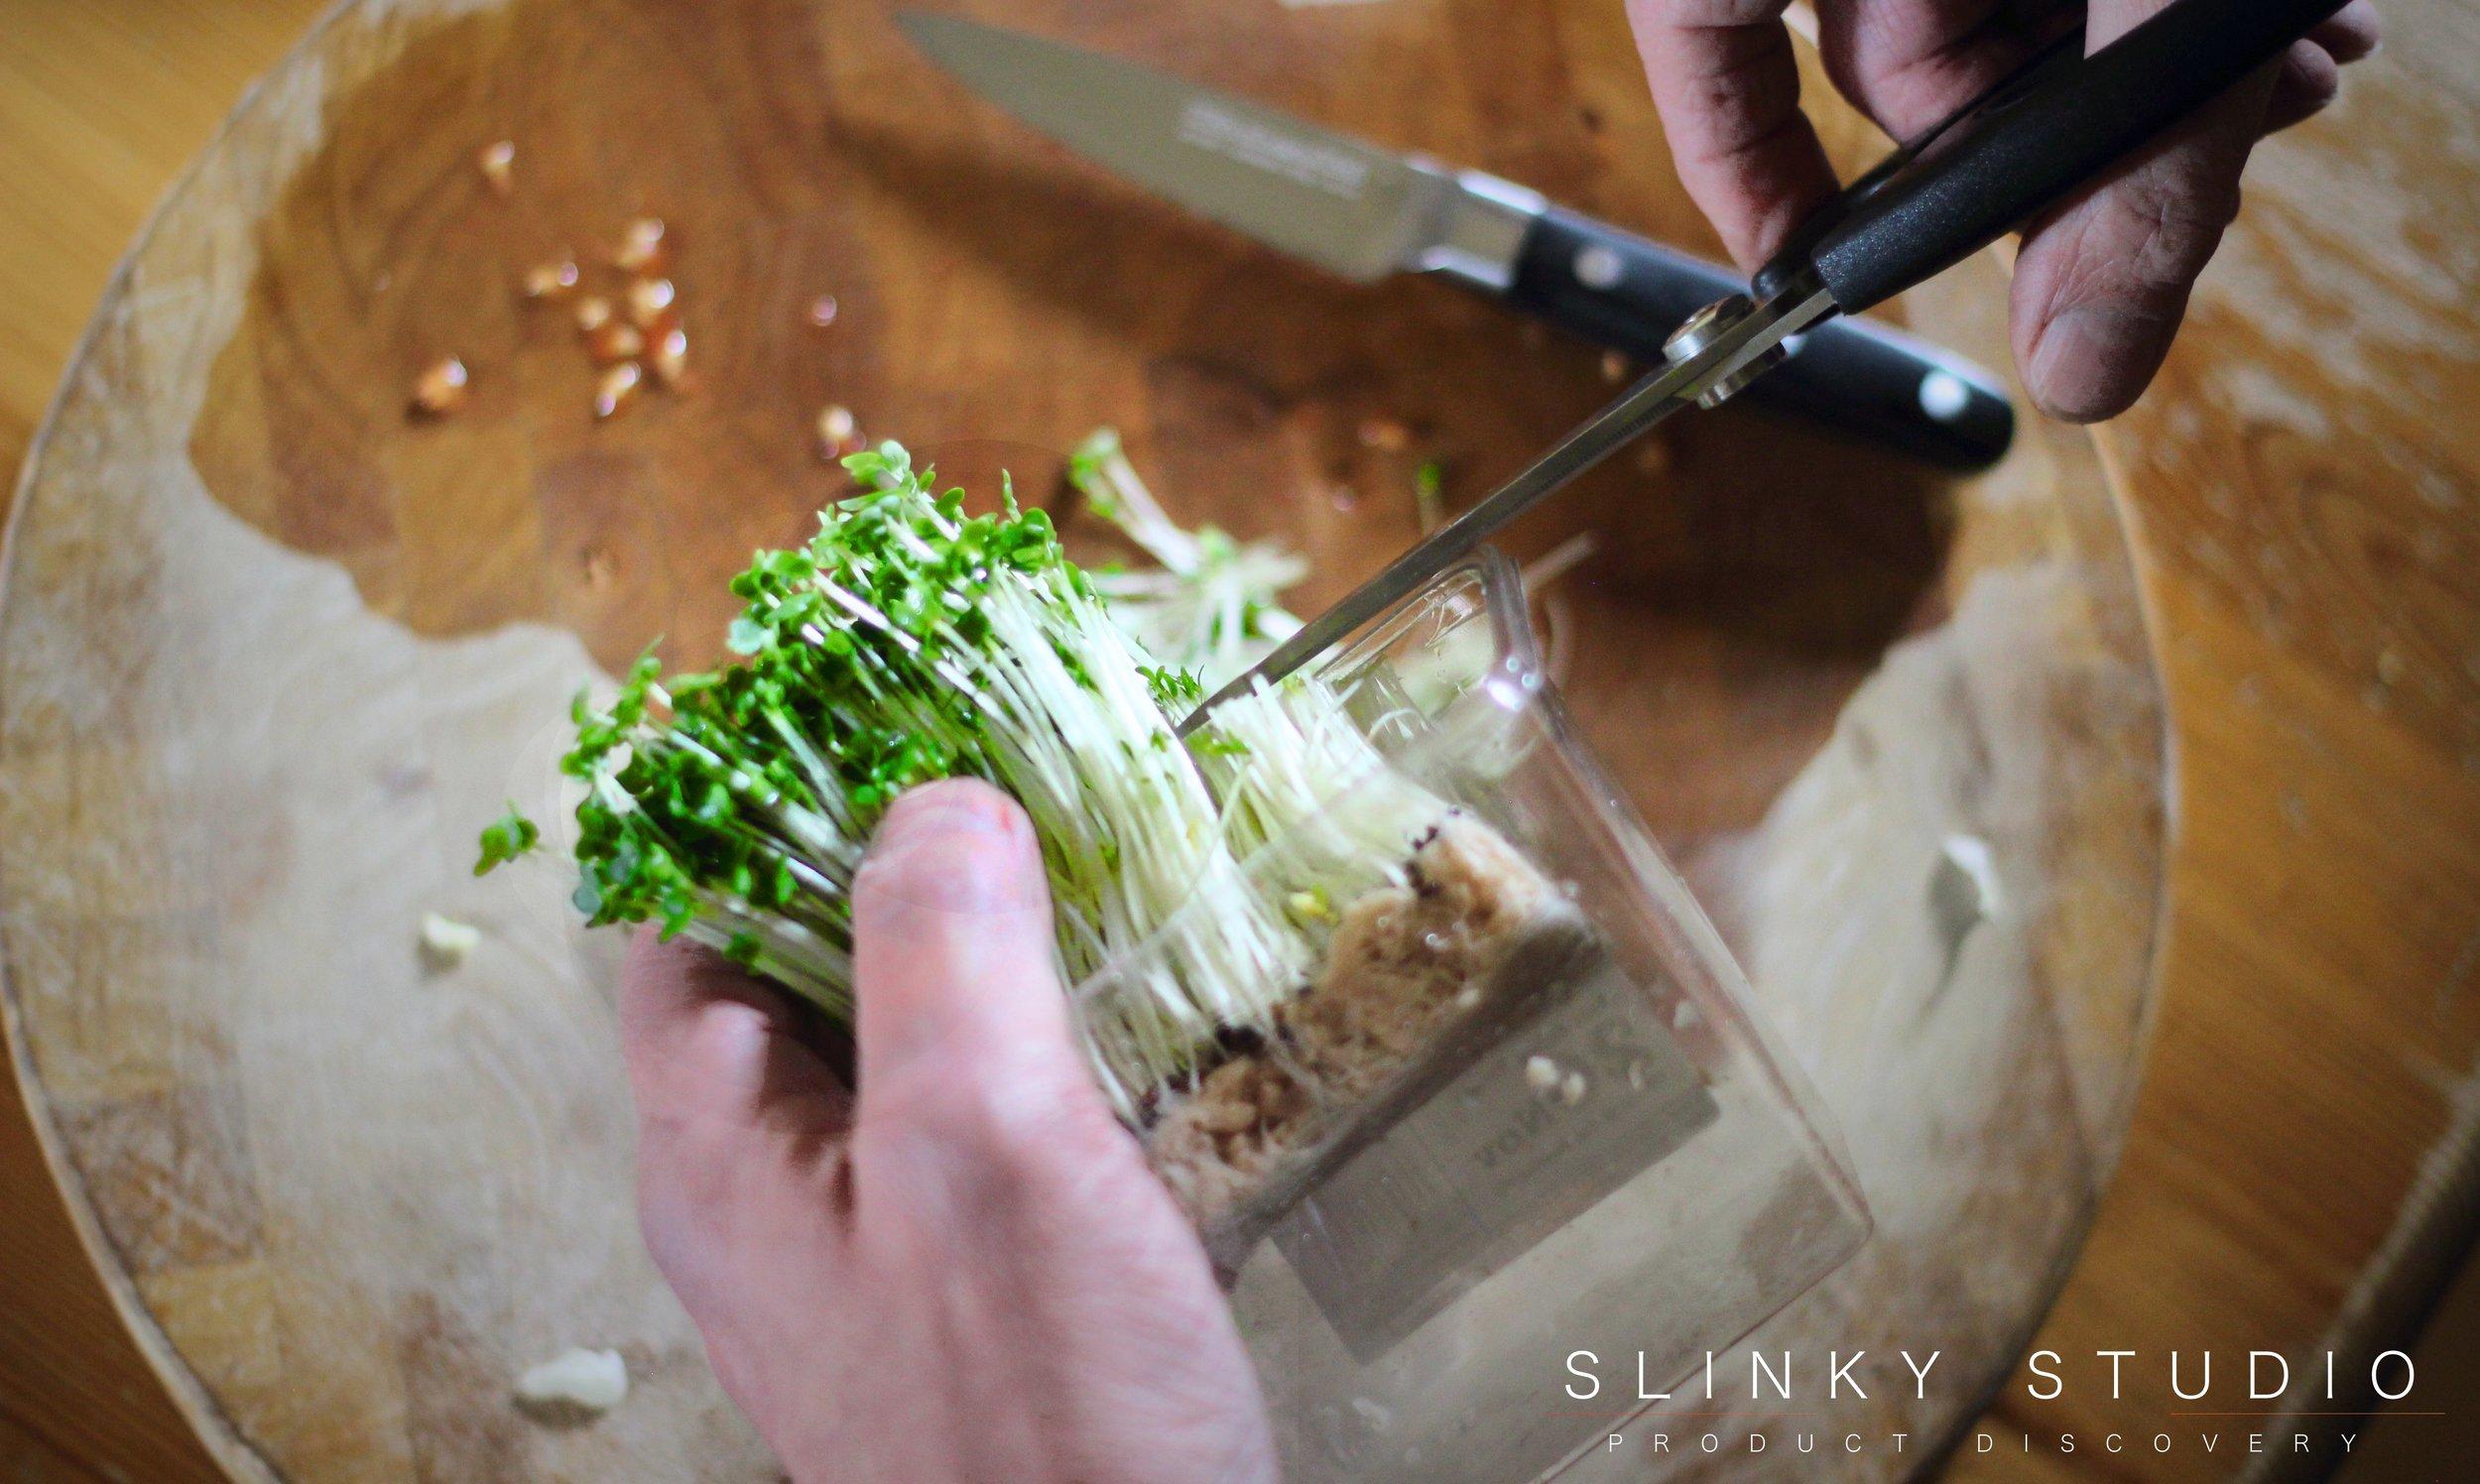 KitchenAid 7pc Professional Series Knife Set Shears Cutting Cress.jpg